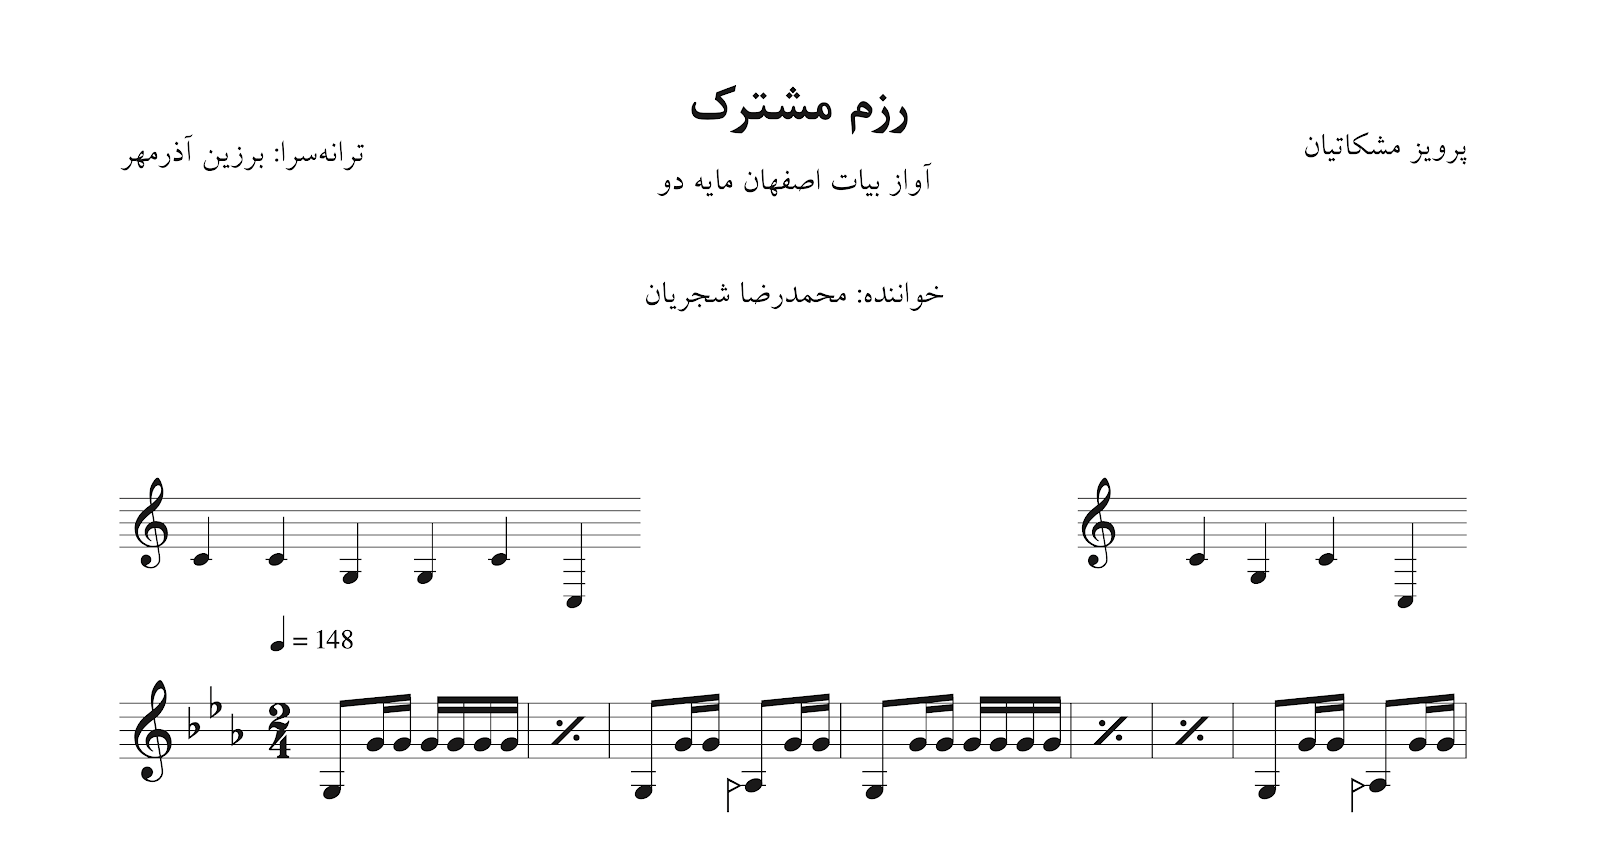 نت رزم مشترک پرویز مشکاتیان محمدرضا شجریان